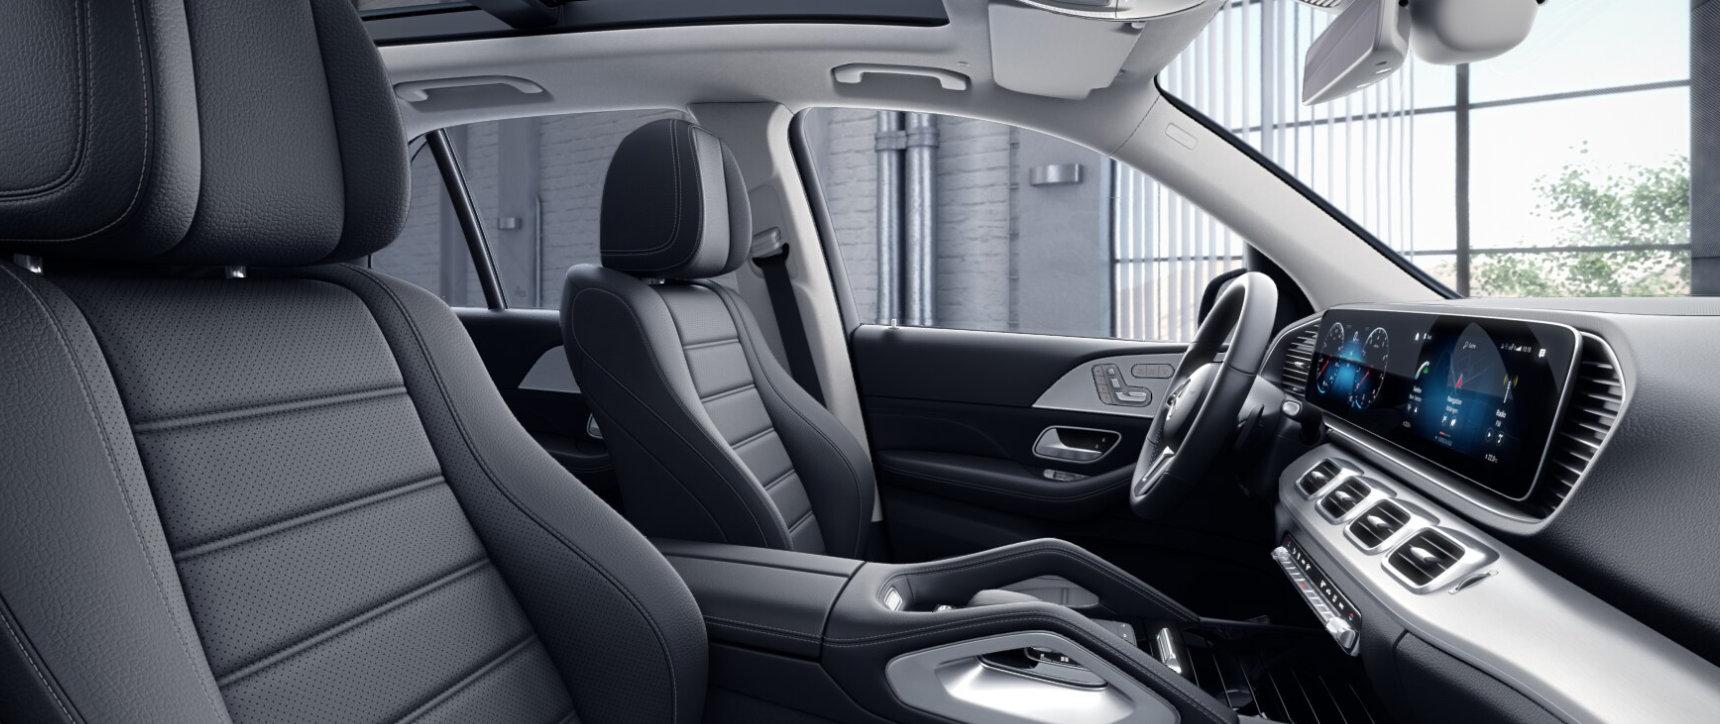 Mercedes-Benz-GLE-leasen-5